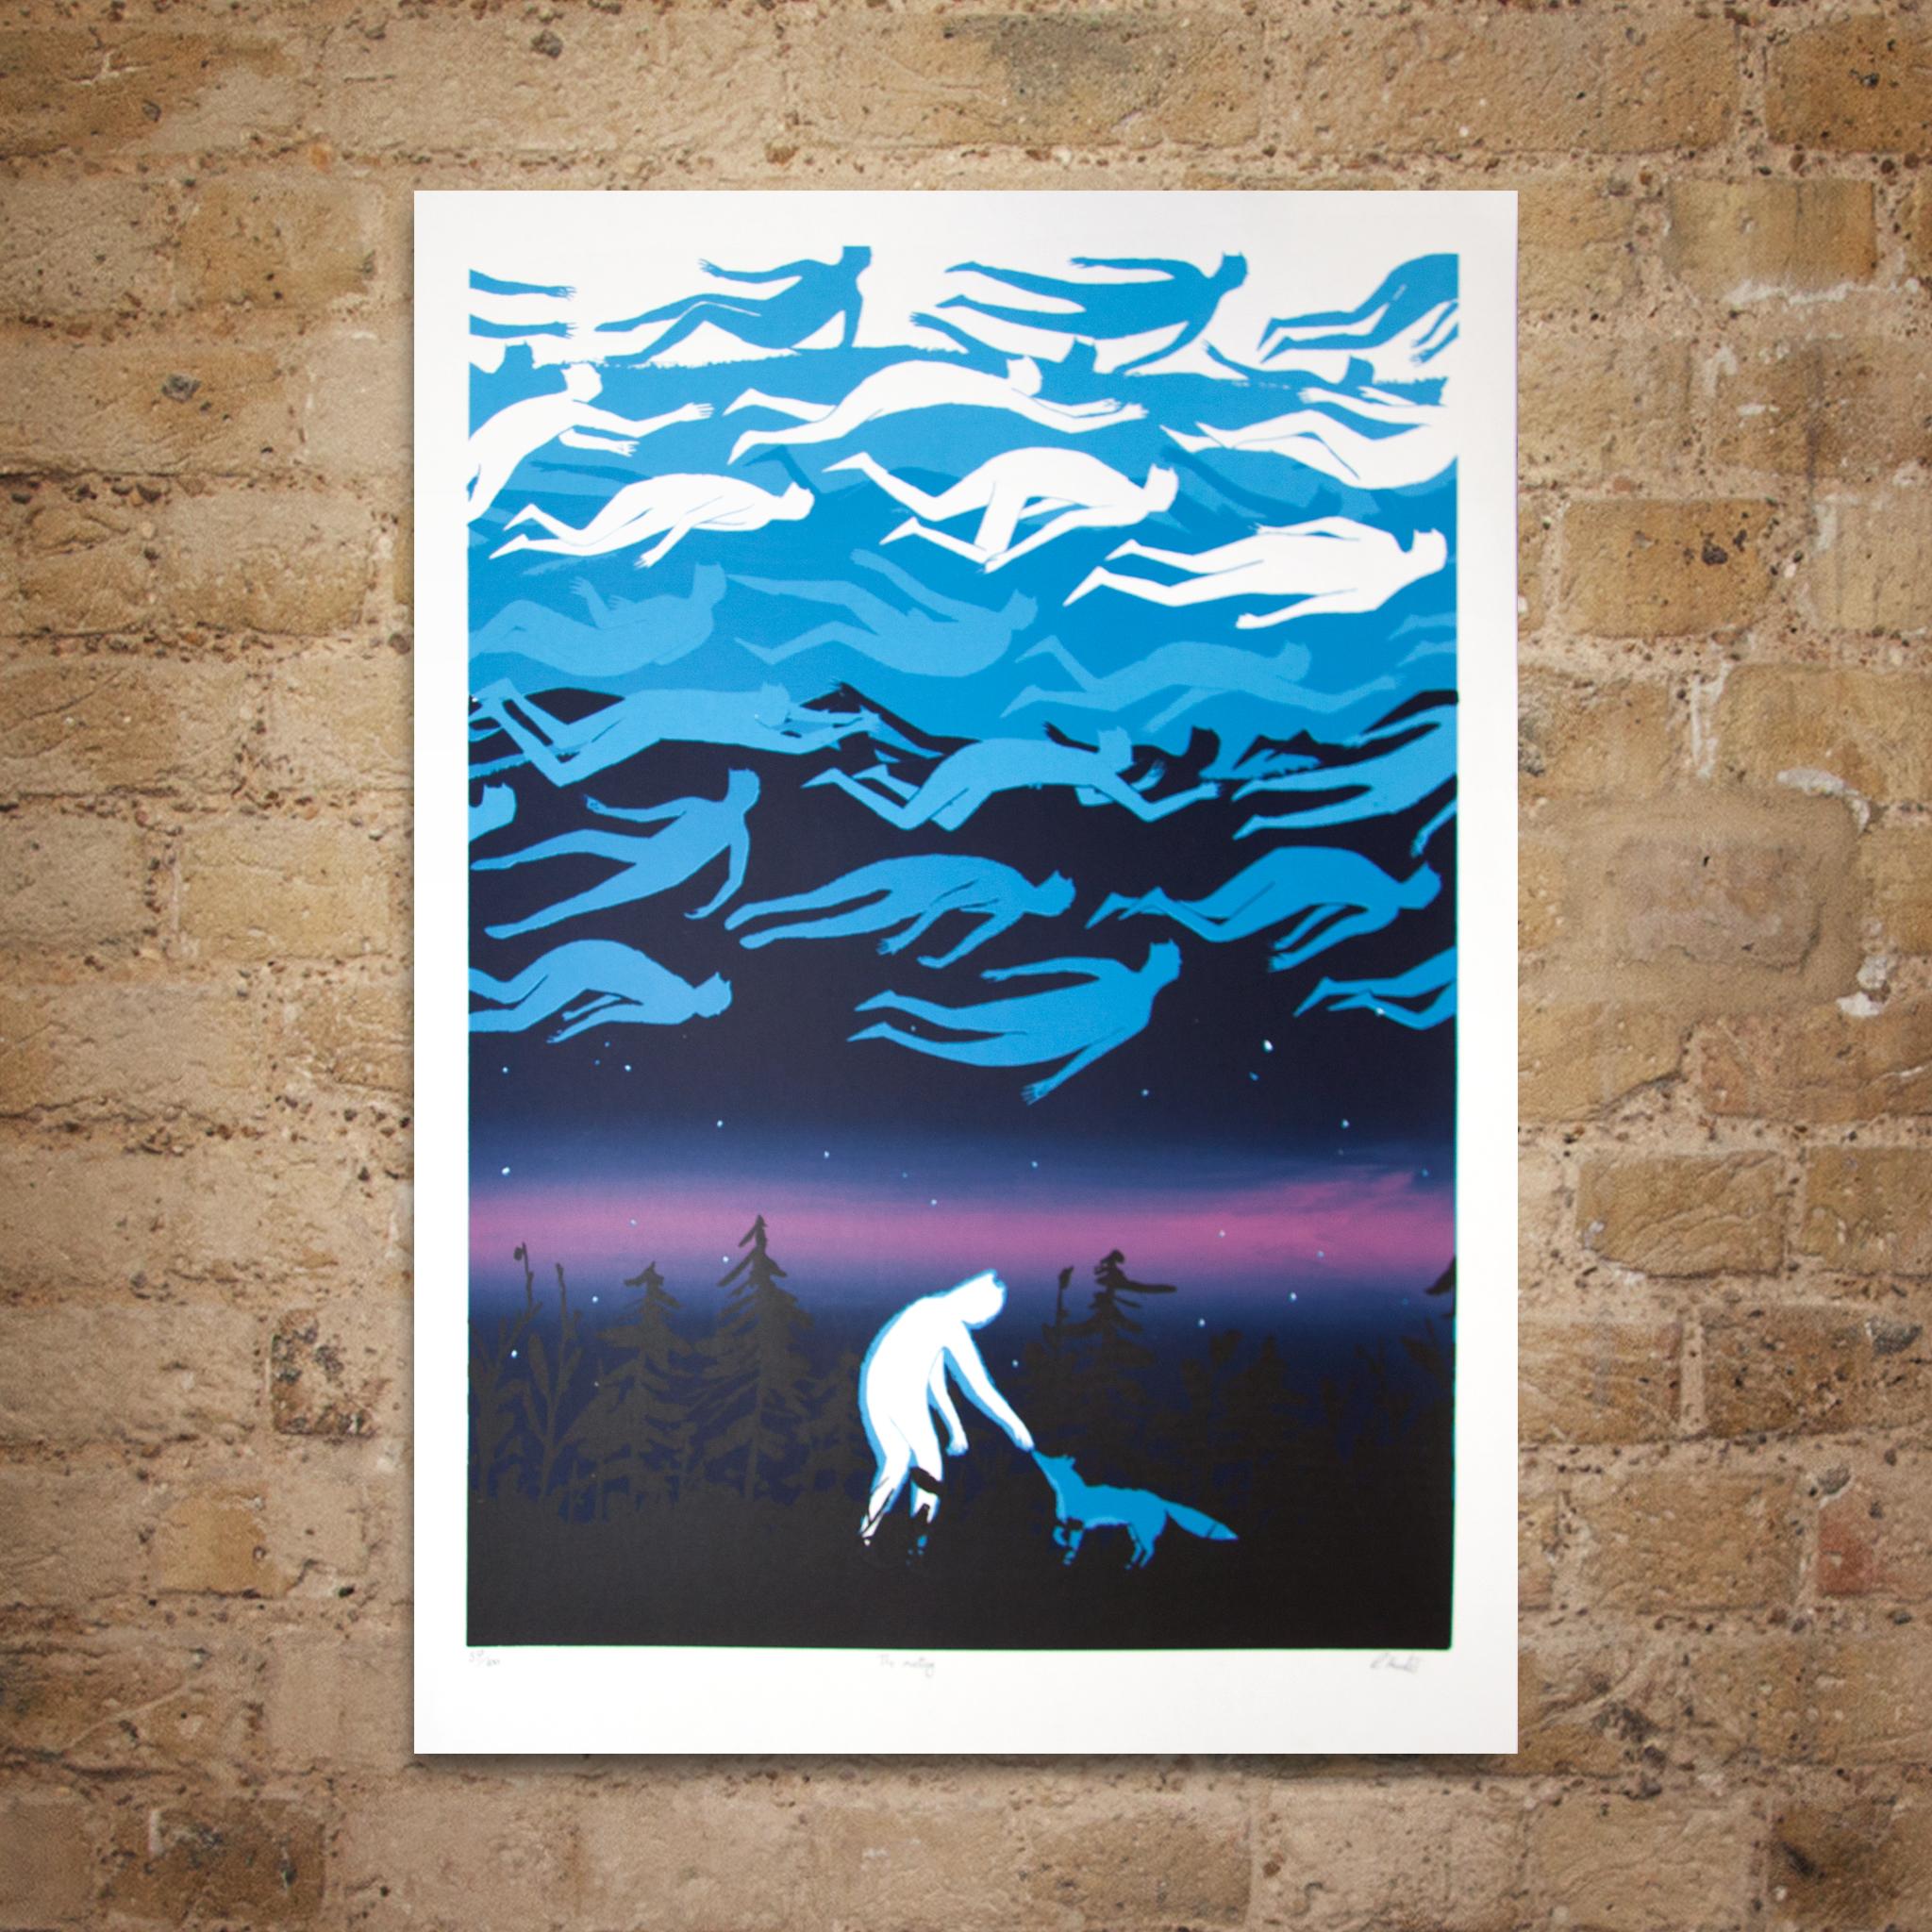 The Meeting print by Rob Hunter